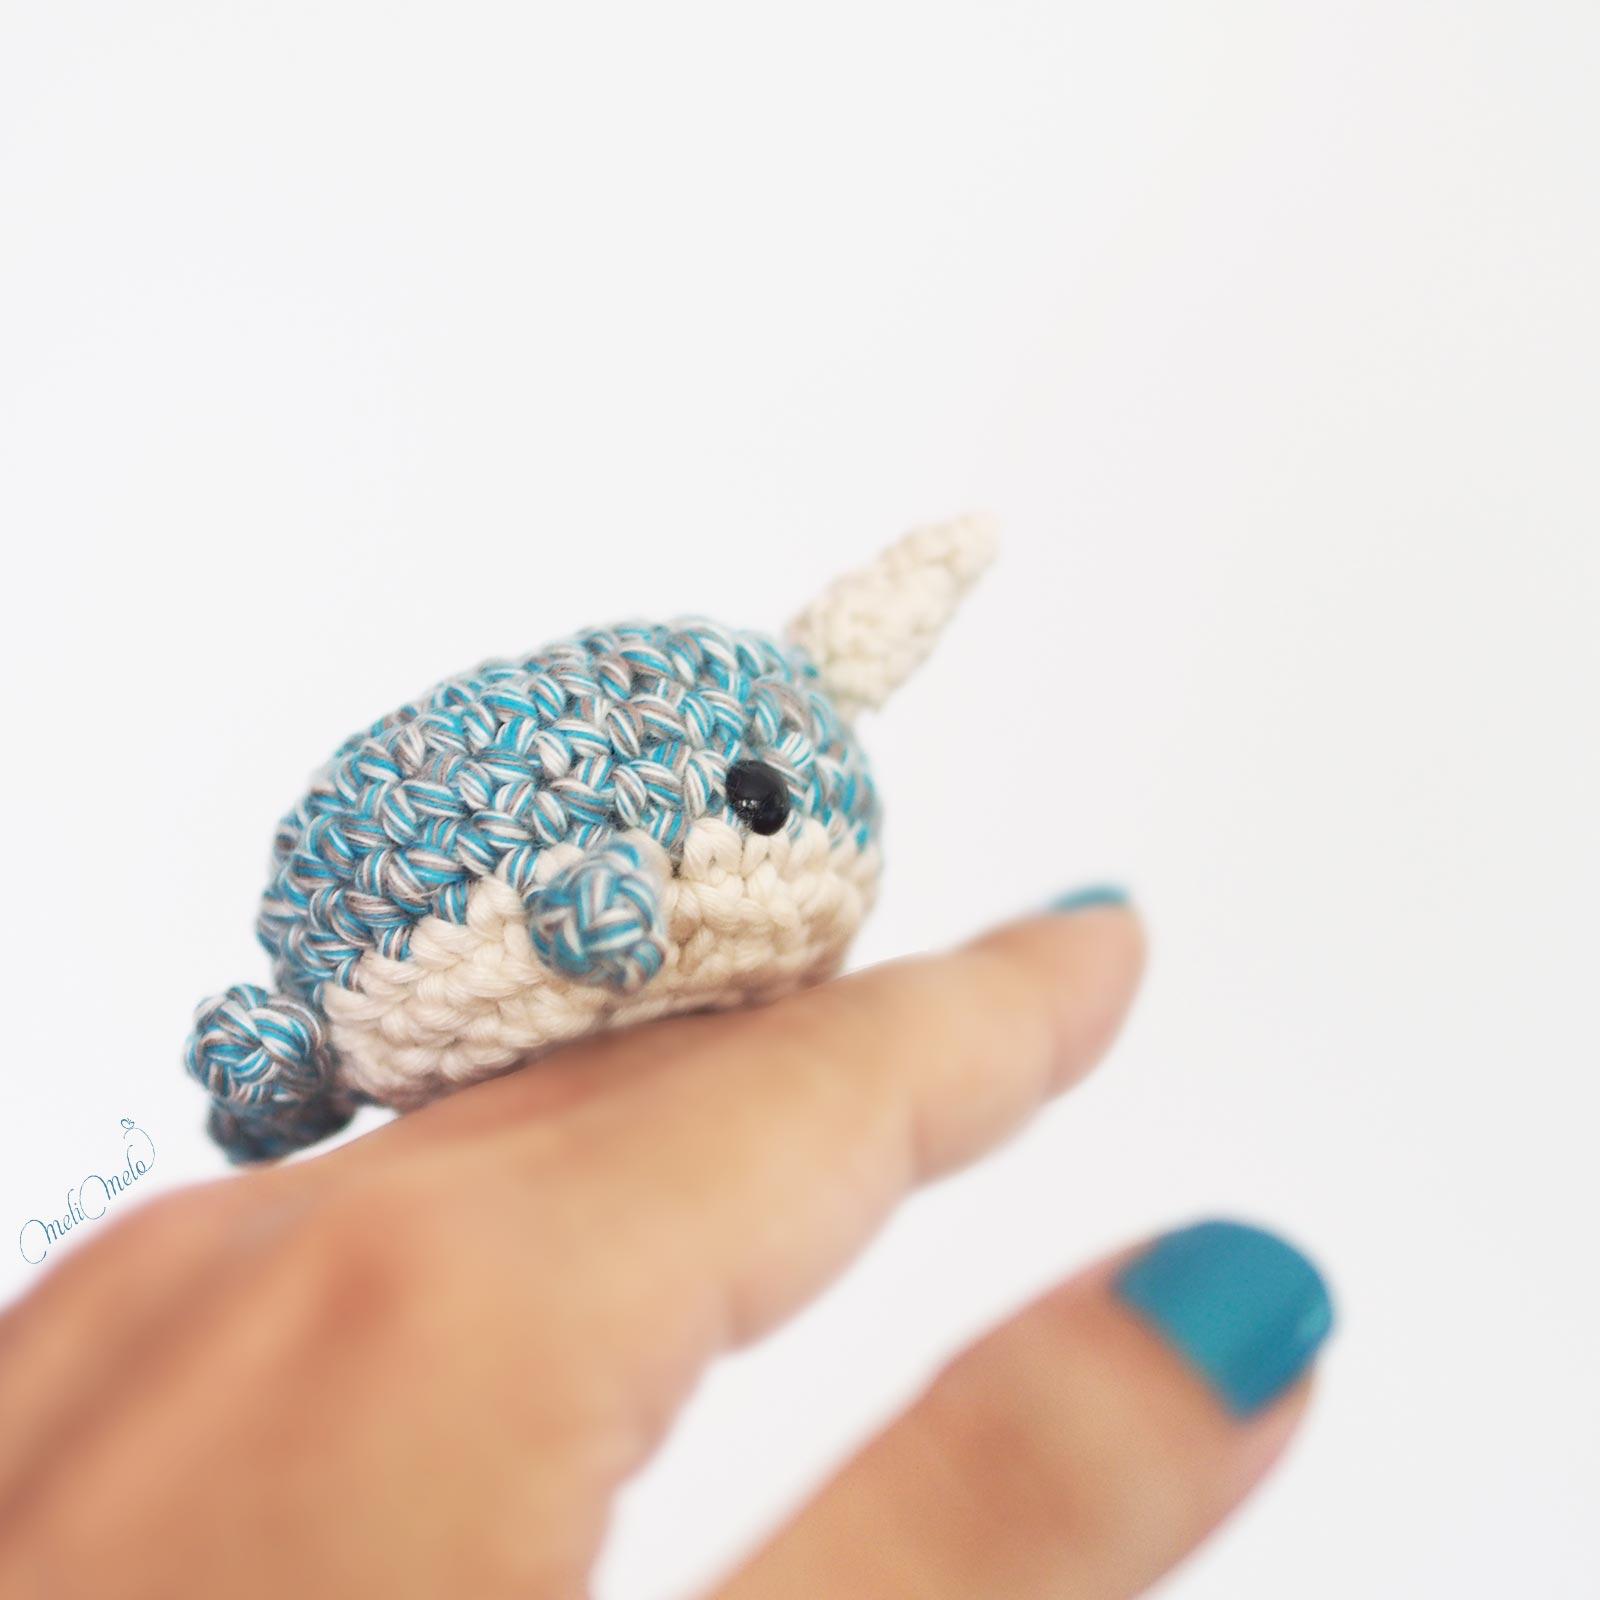 crochet narval amigurumi coton happyshinycotton woolandthegang laboutiquedemelimelo